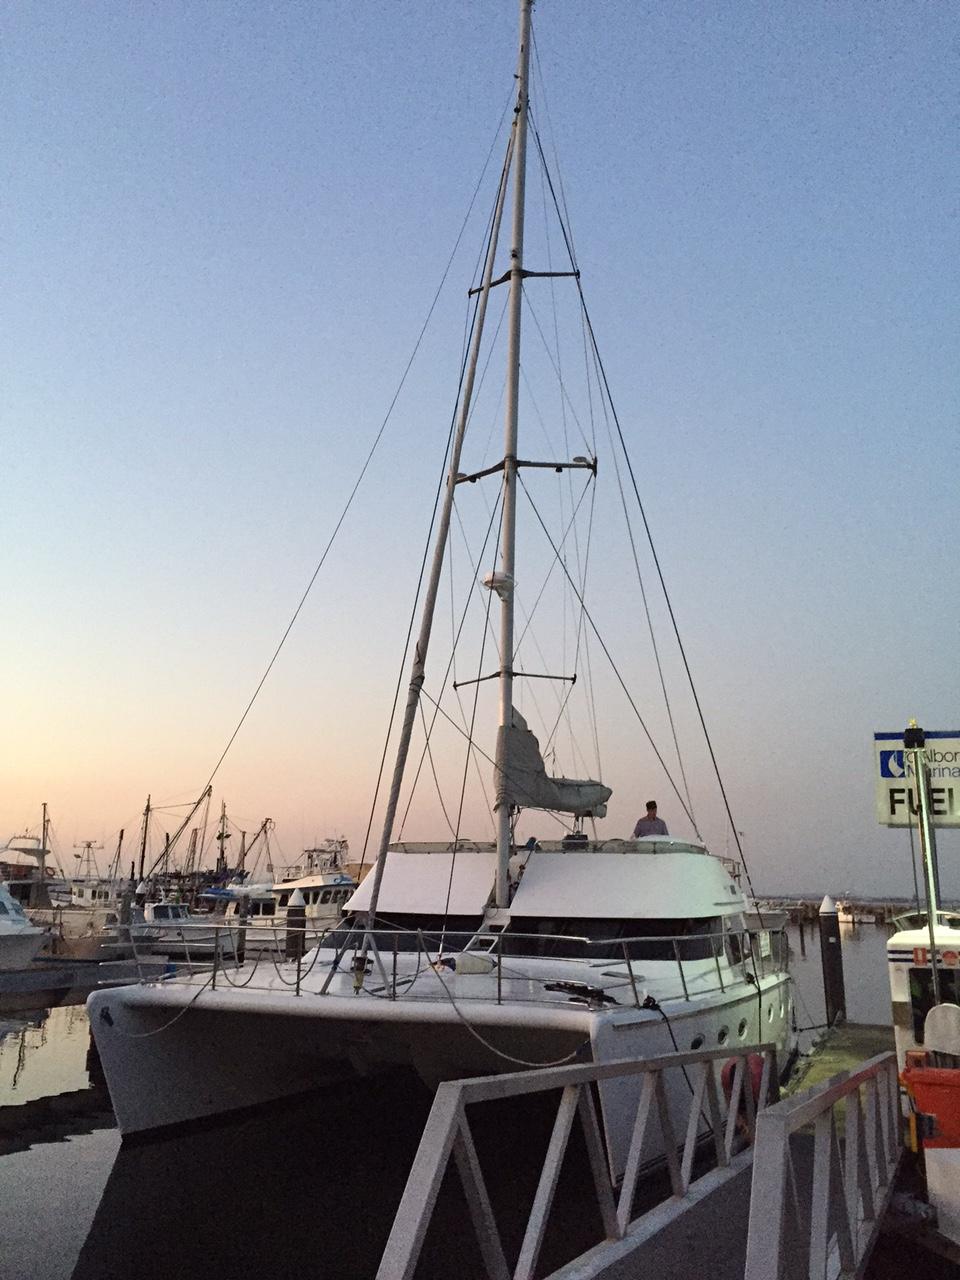 Sailing Yacht Adelina - Premium Harbour Cruise